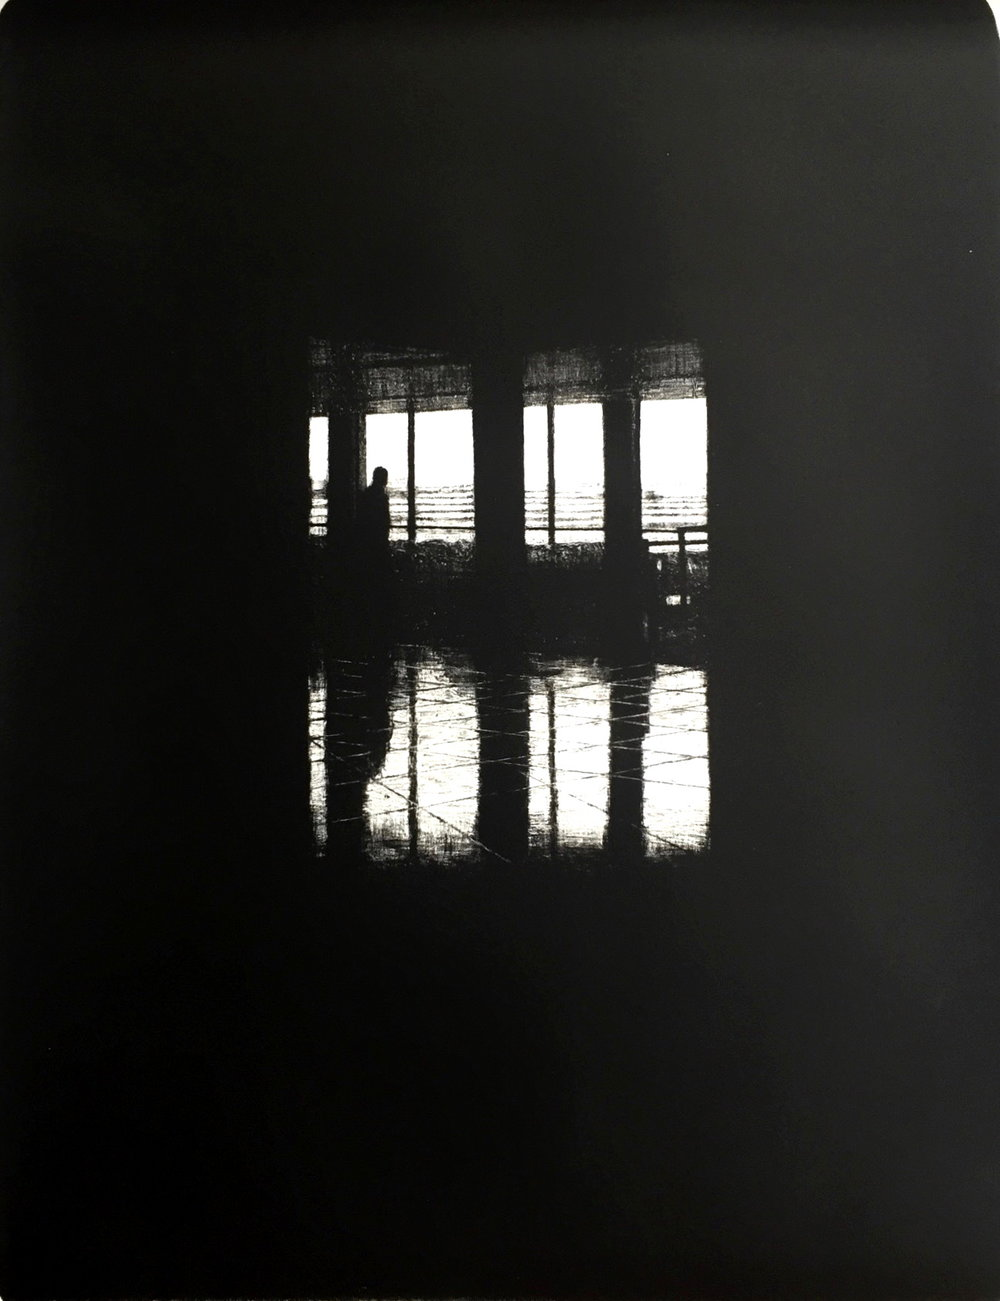 Departures III (JFK), 2016, lithograph, 55cm x 75cm, Ed. 12